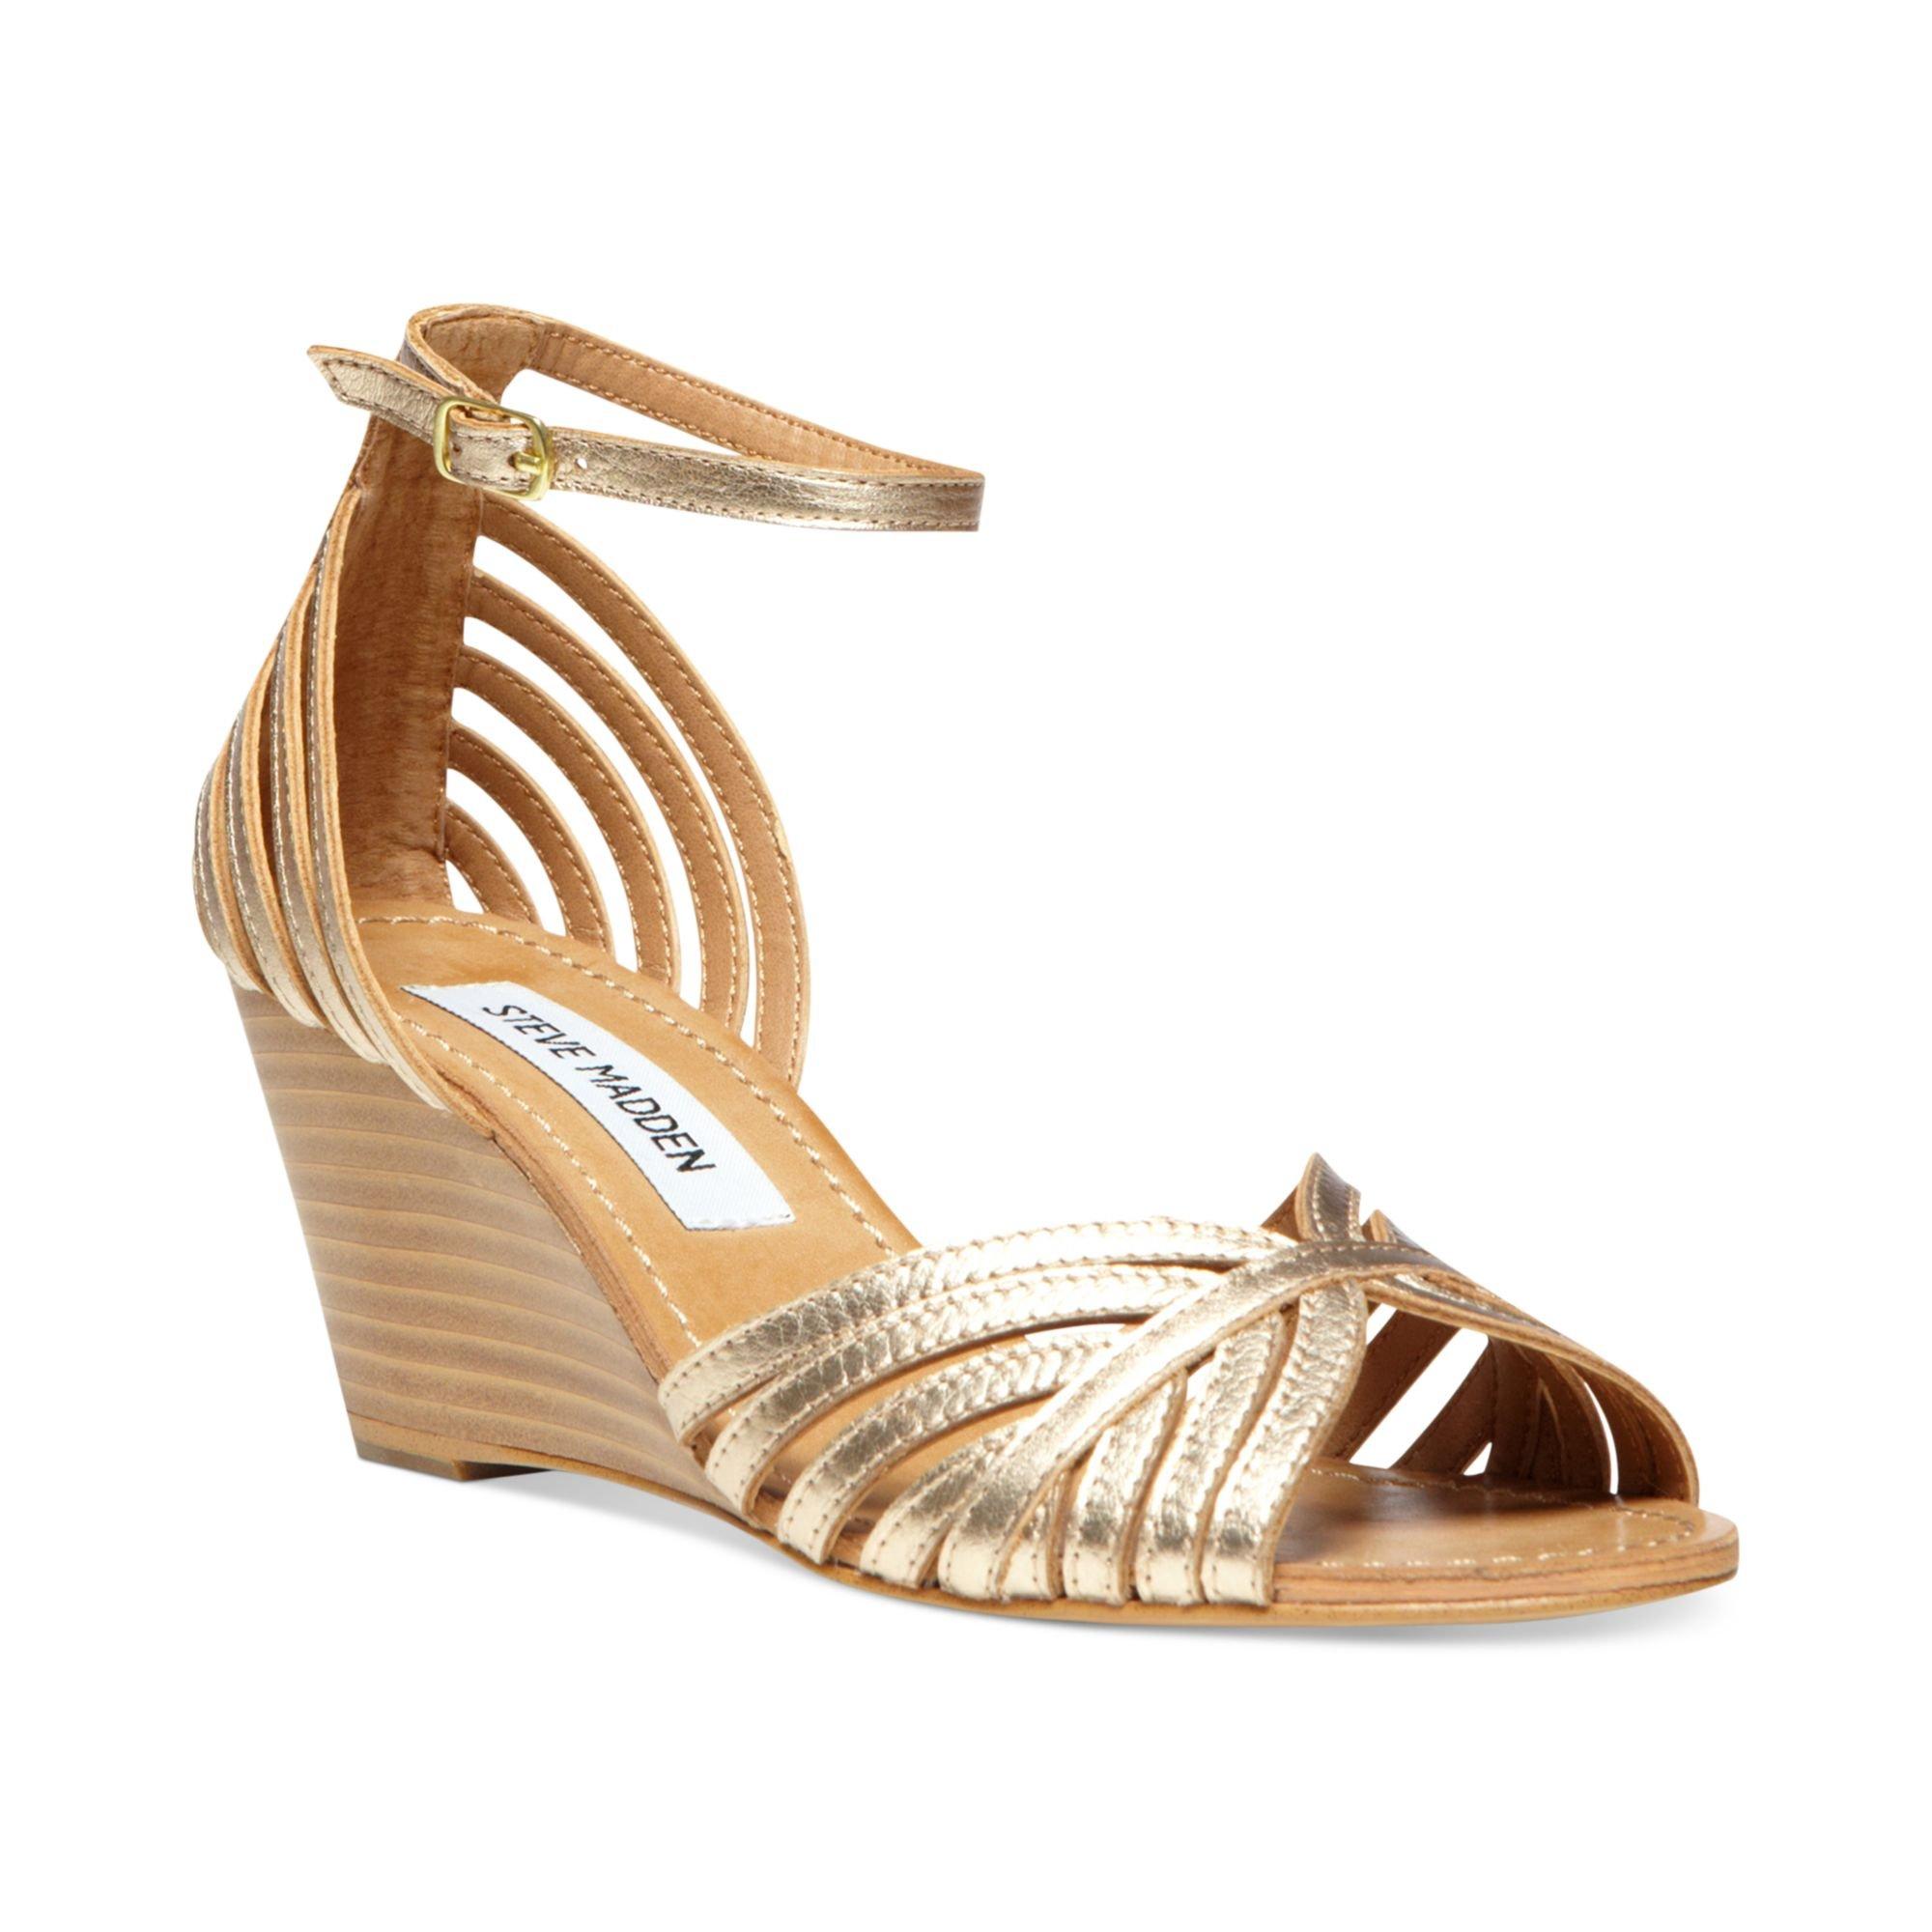 Lyst Steve Madden Womens Lexii Demi Wedge Sandals In